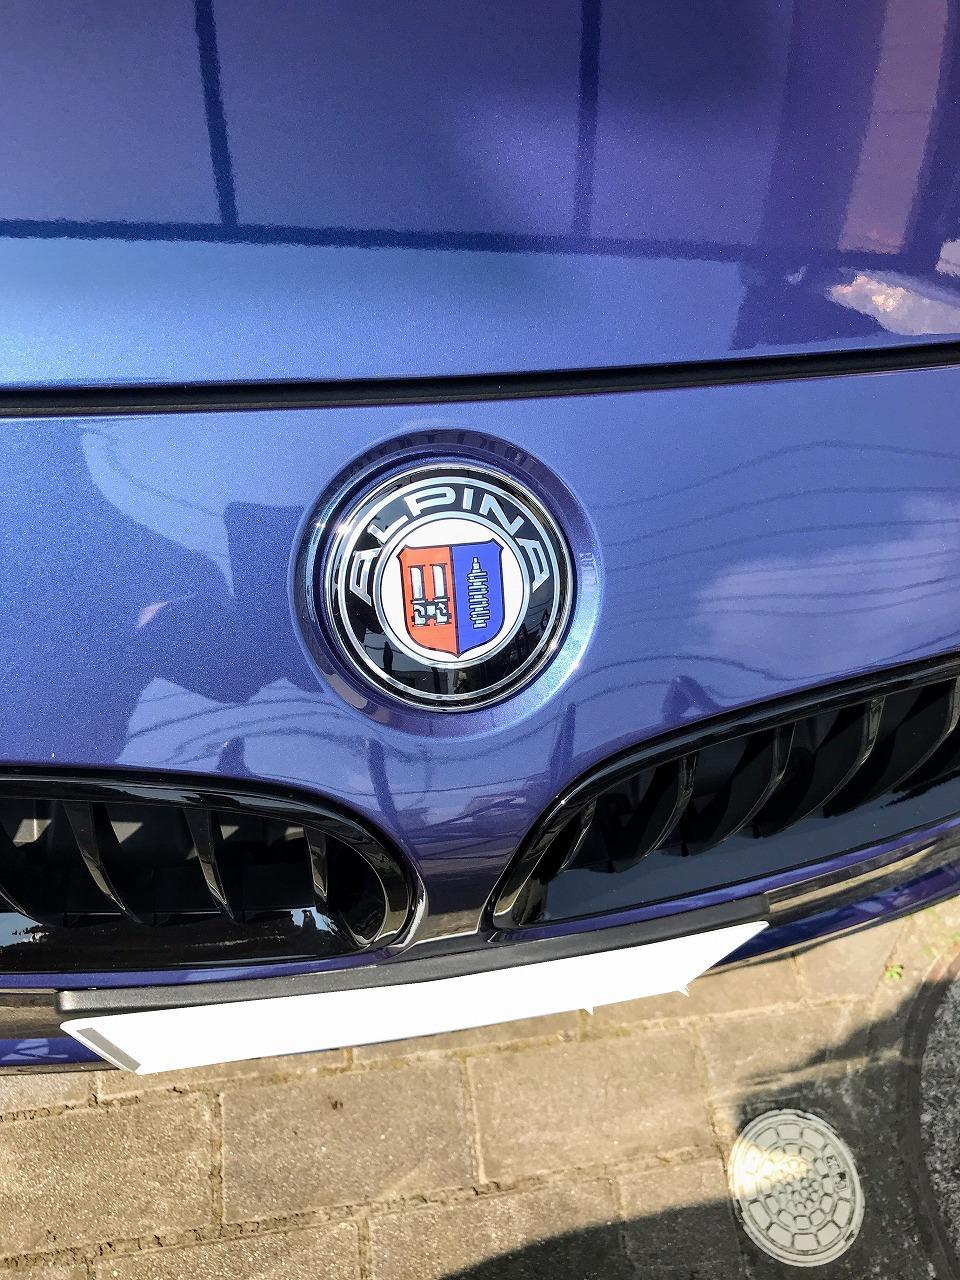 BMW純正ディーゼル添加剤はアルピナのディーゼルモデルにはNGだそうです><